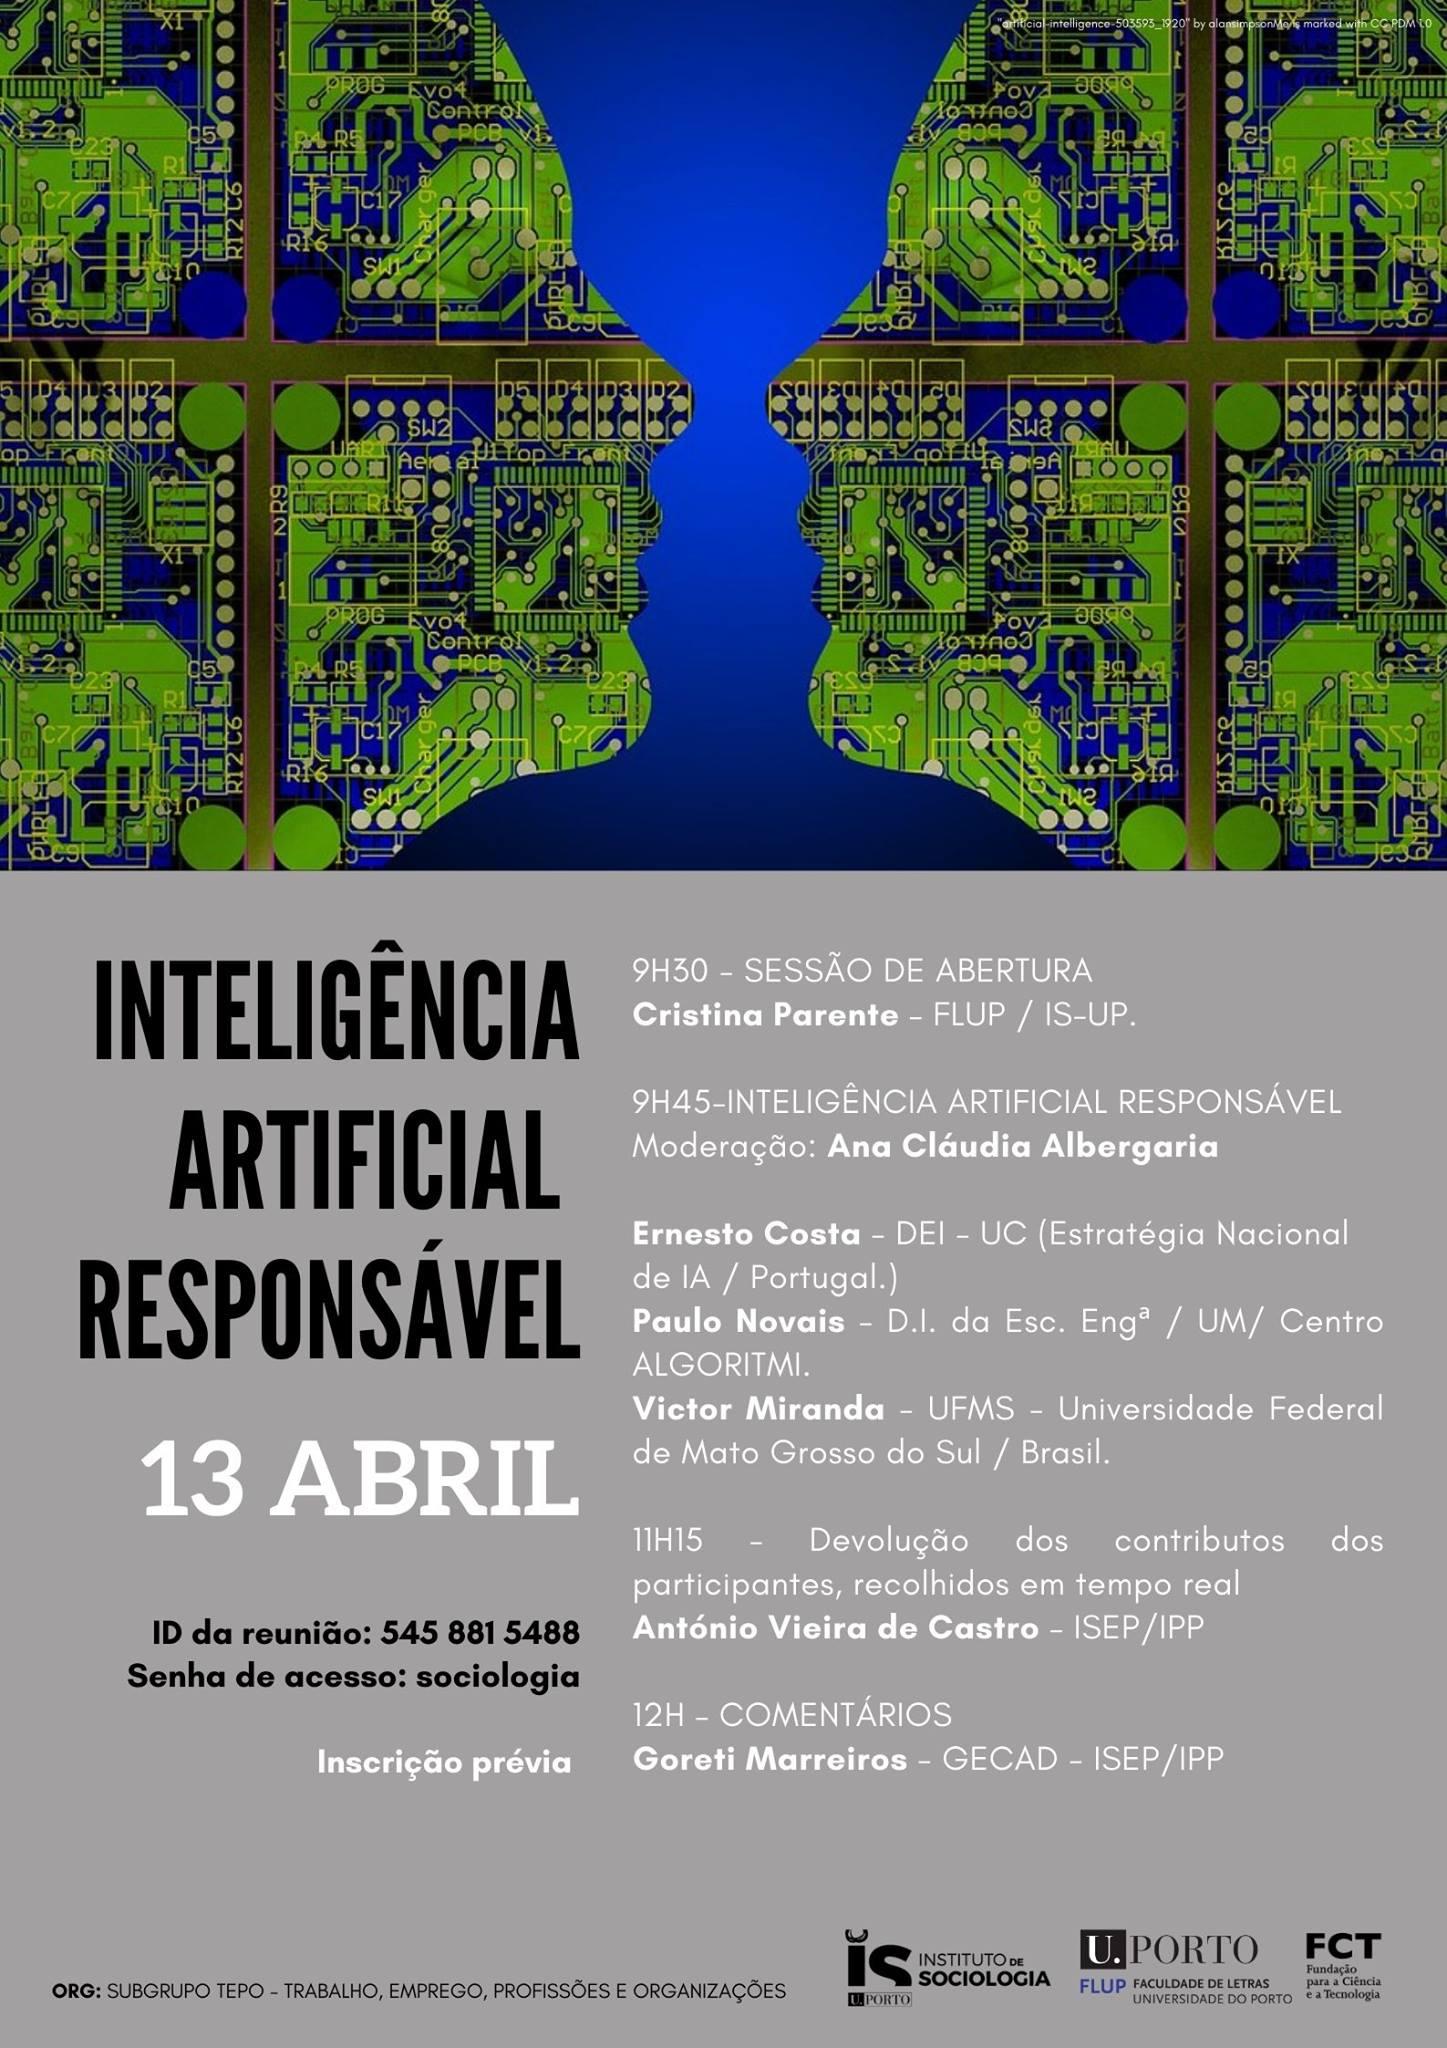 Conferência online | Inteligência Artificial Responsável